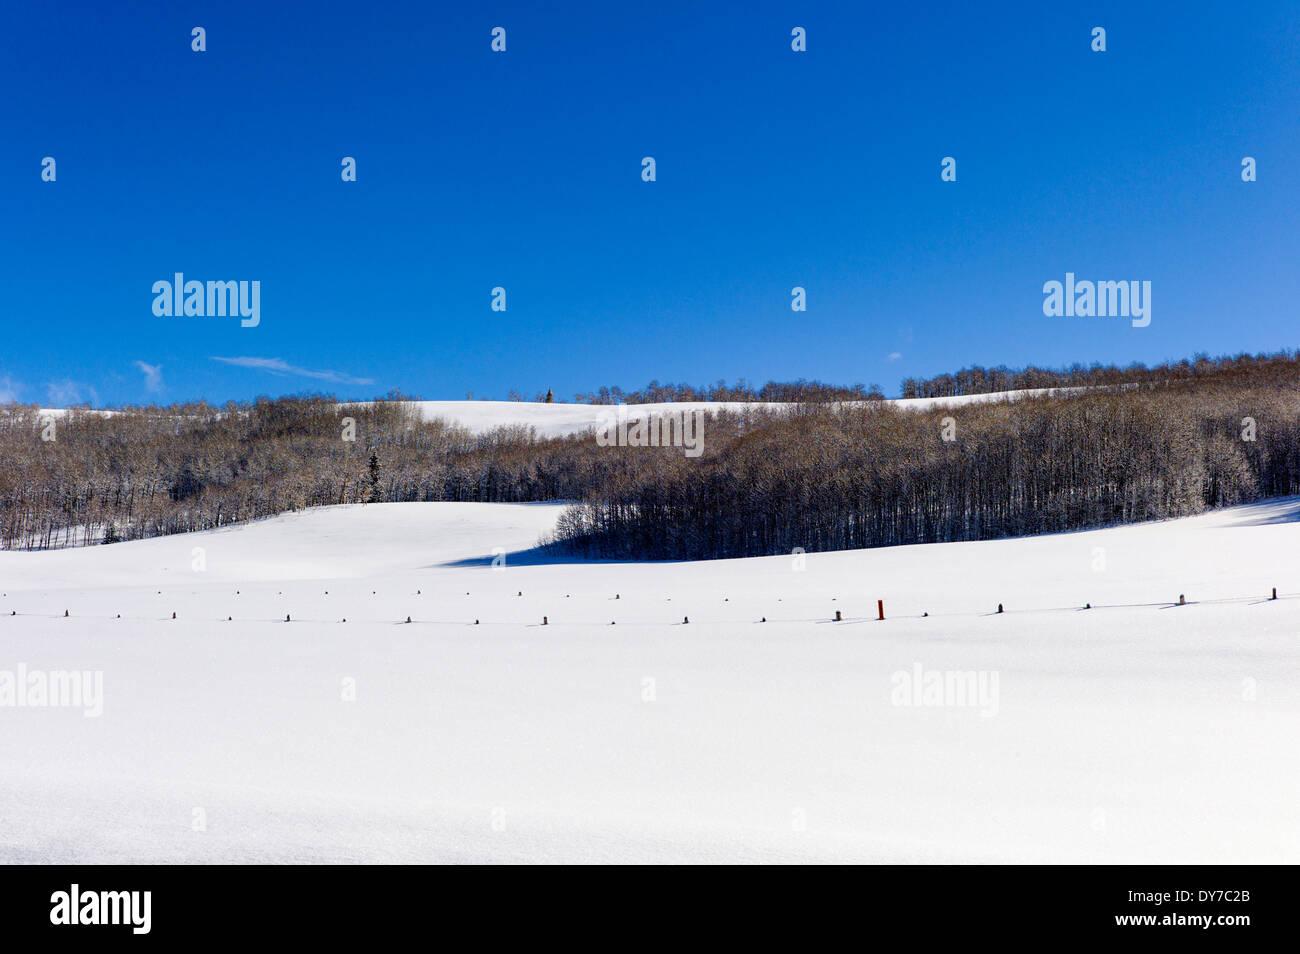 Barren winter landscape, Bridger Wilderness, Wind River Range of mountains, Wyoming, USA - Stock Image